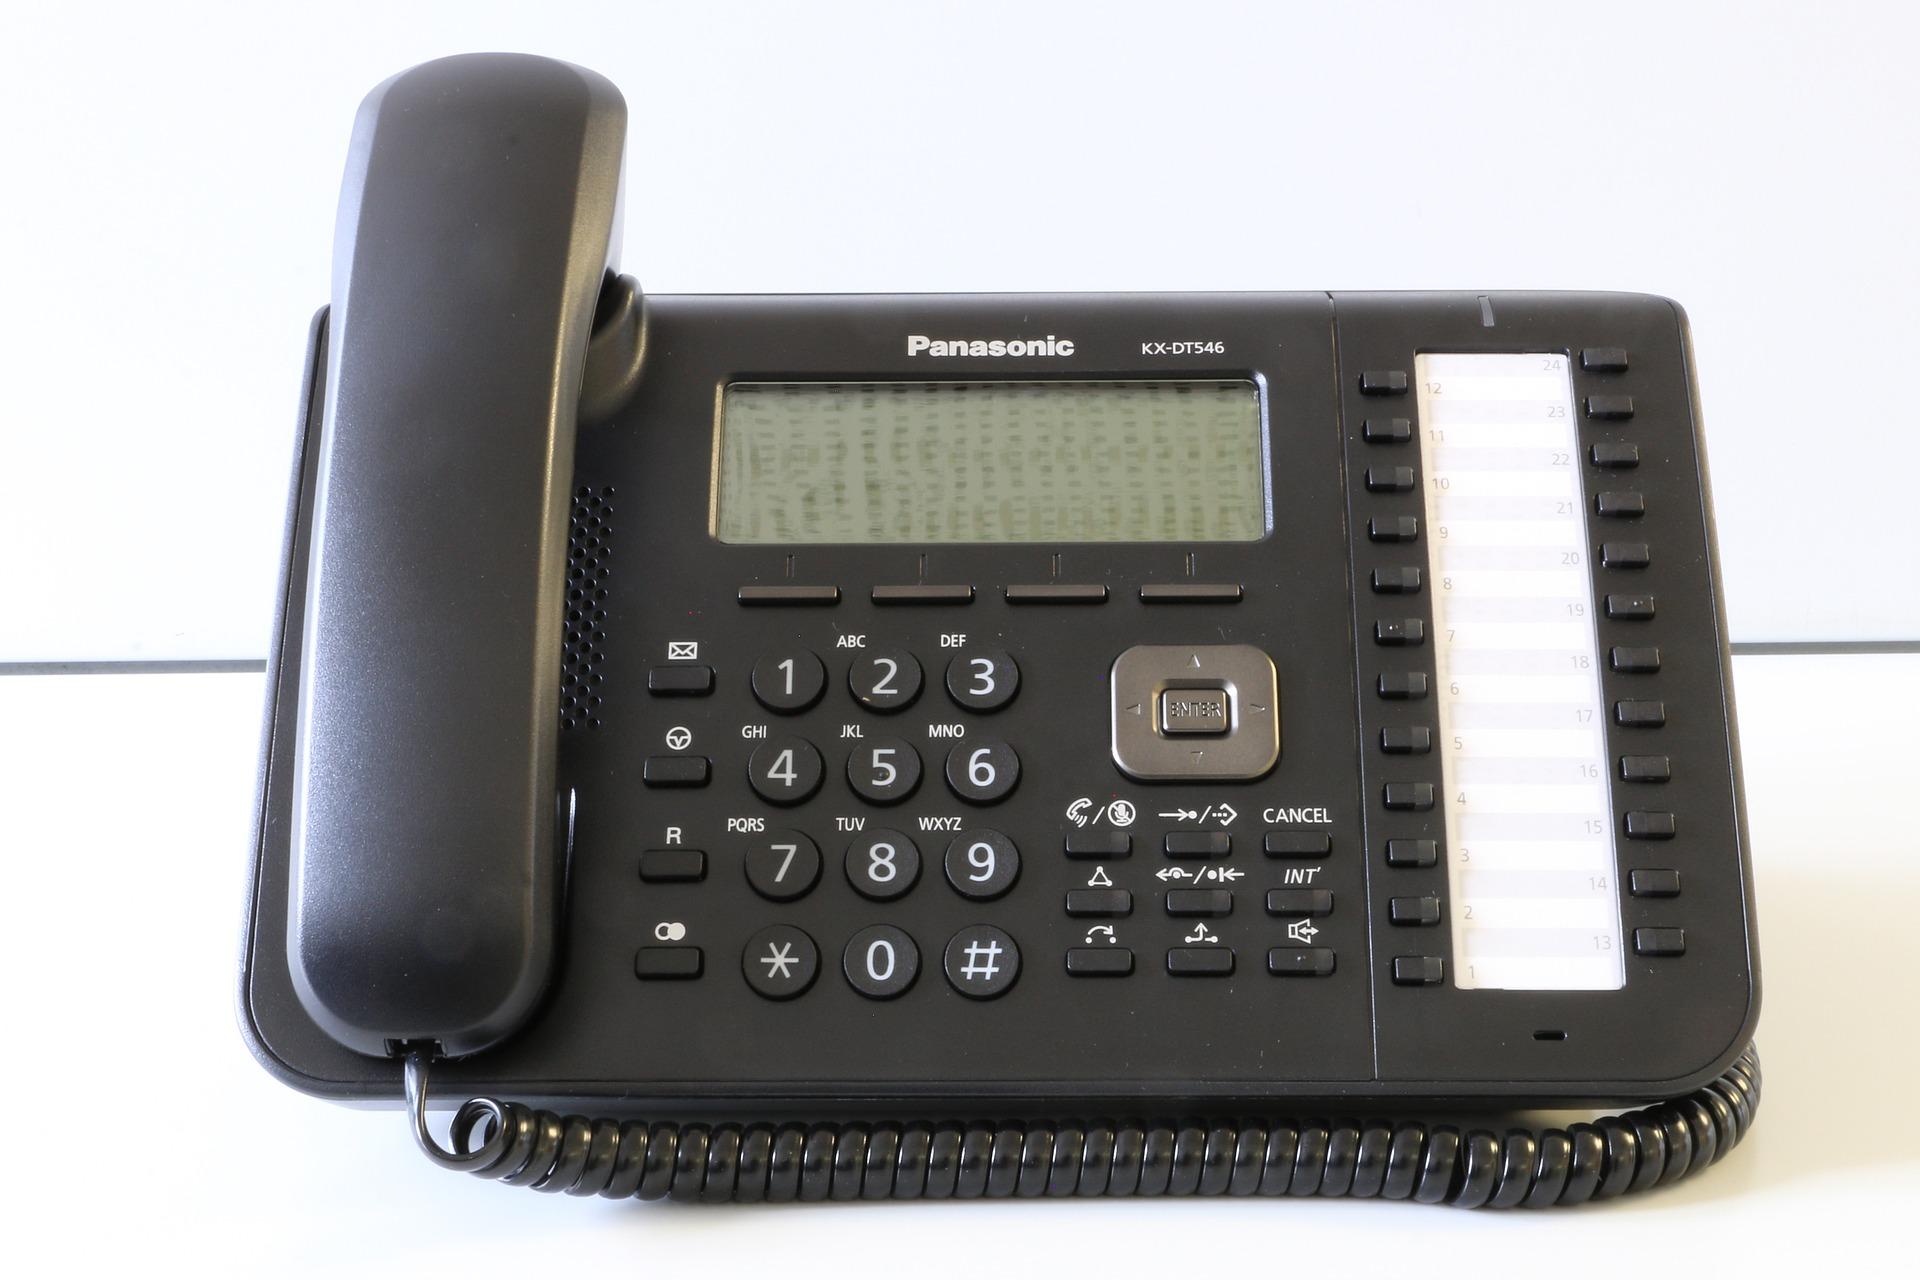 phone-1463406_1920 (1)